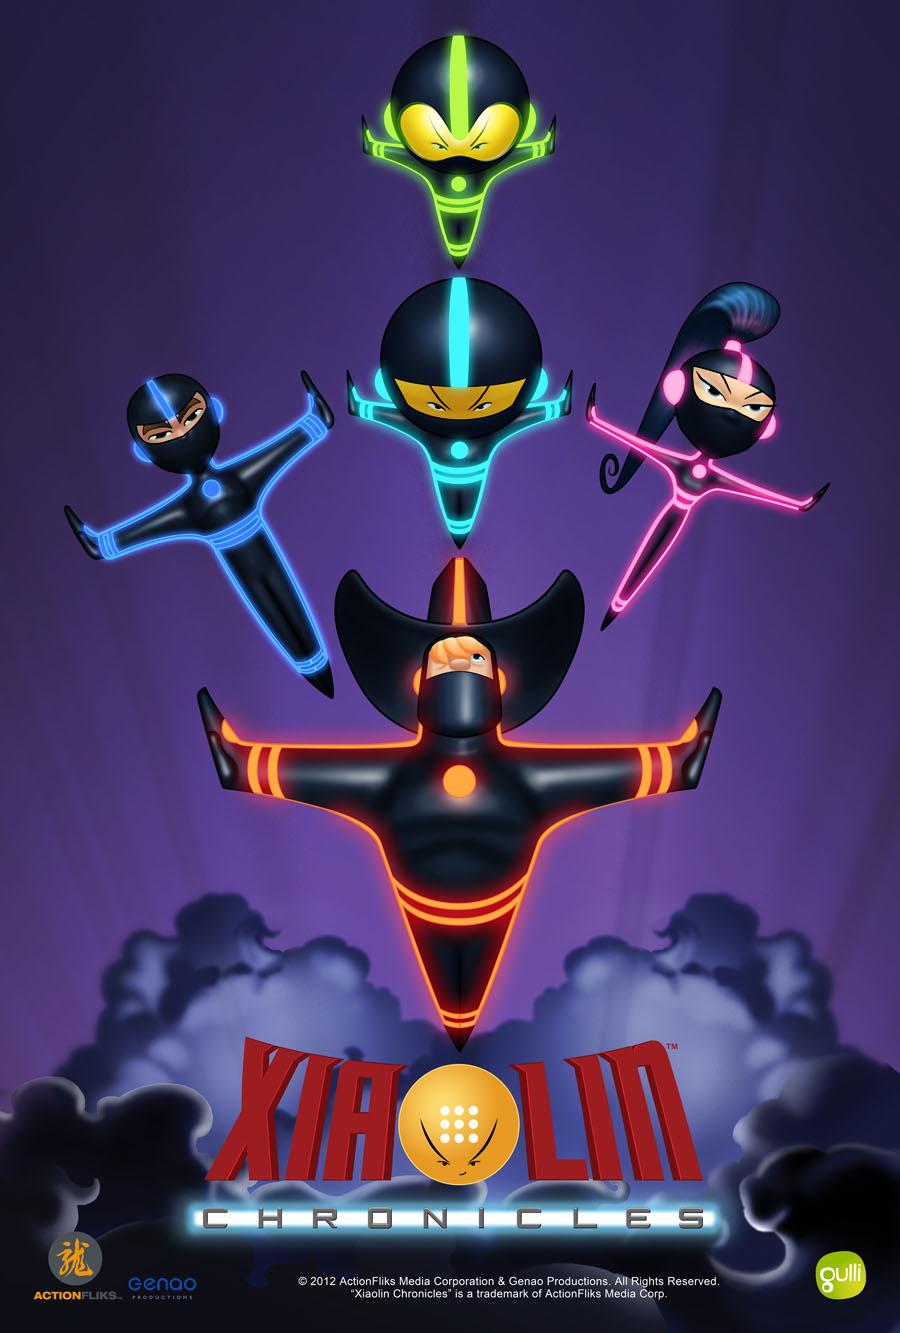 xiaolin chronicles poster - Xiaolin Showdown Photo ... Шаолиньские Хроники Кимико